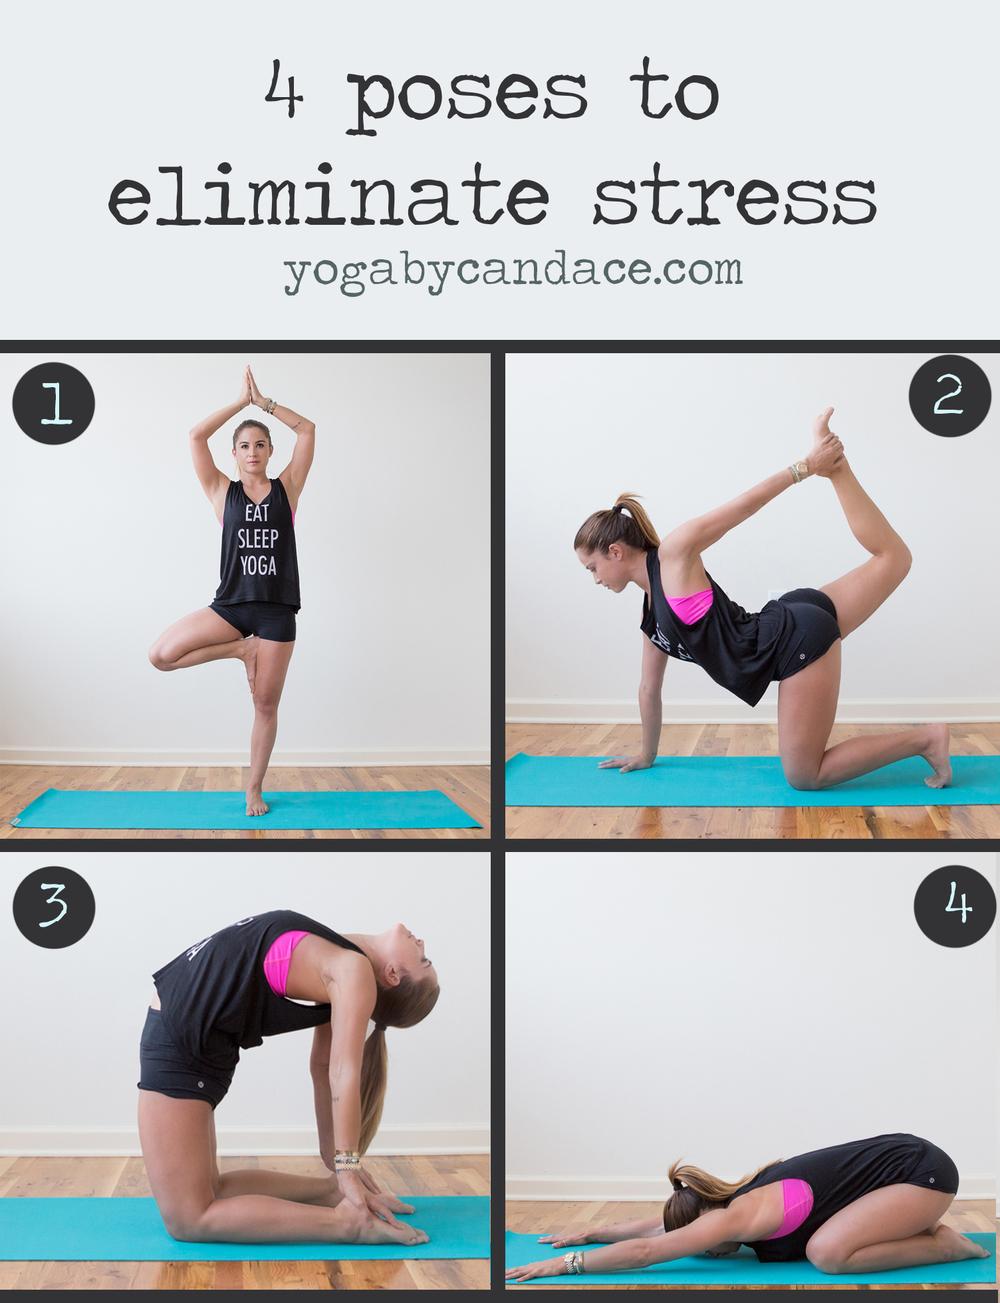 Pin now, practice later! Wearing: Sociable Apparel tank c/o, lululemon shorts. Using Jade yoga mat.